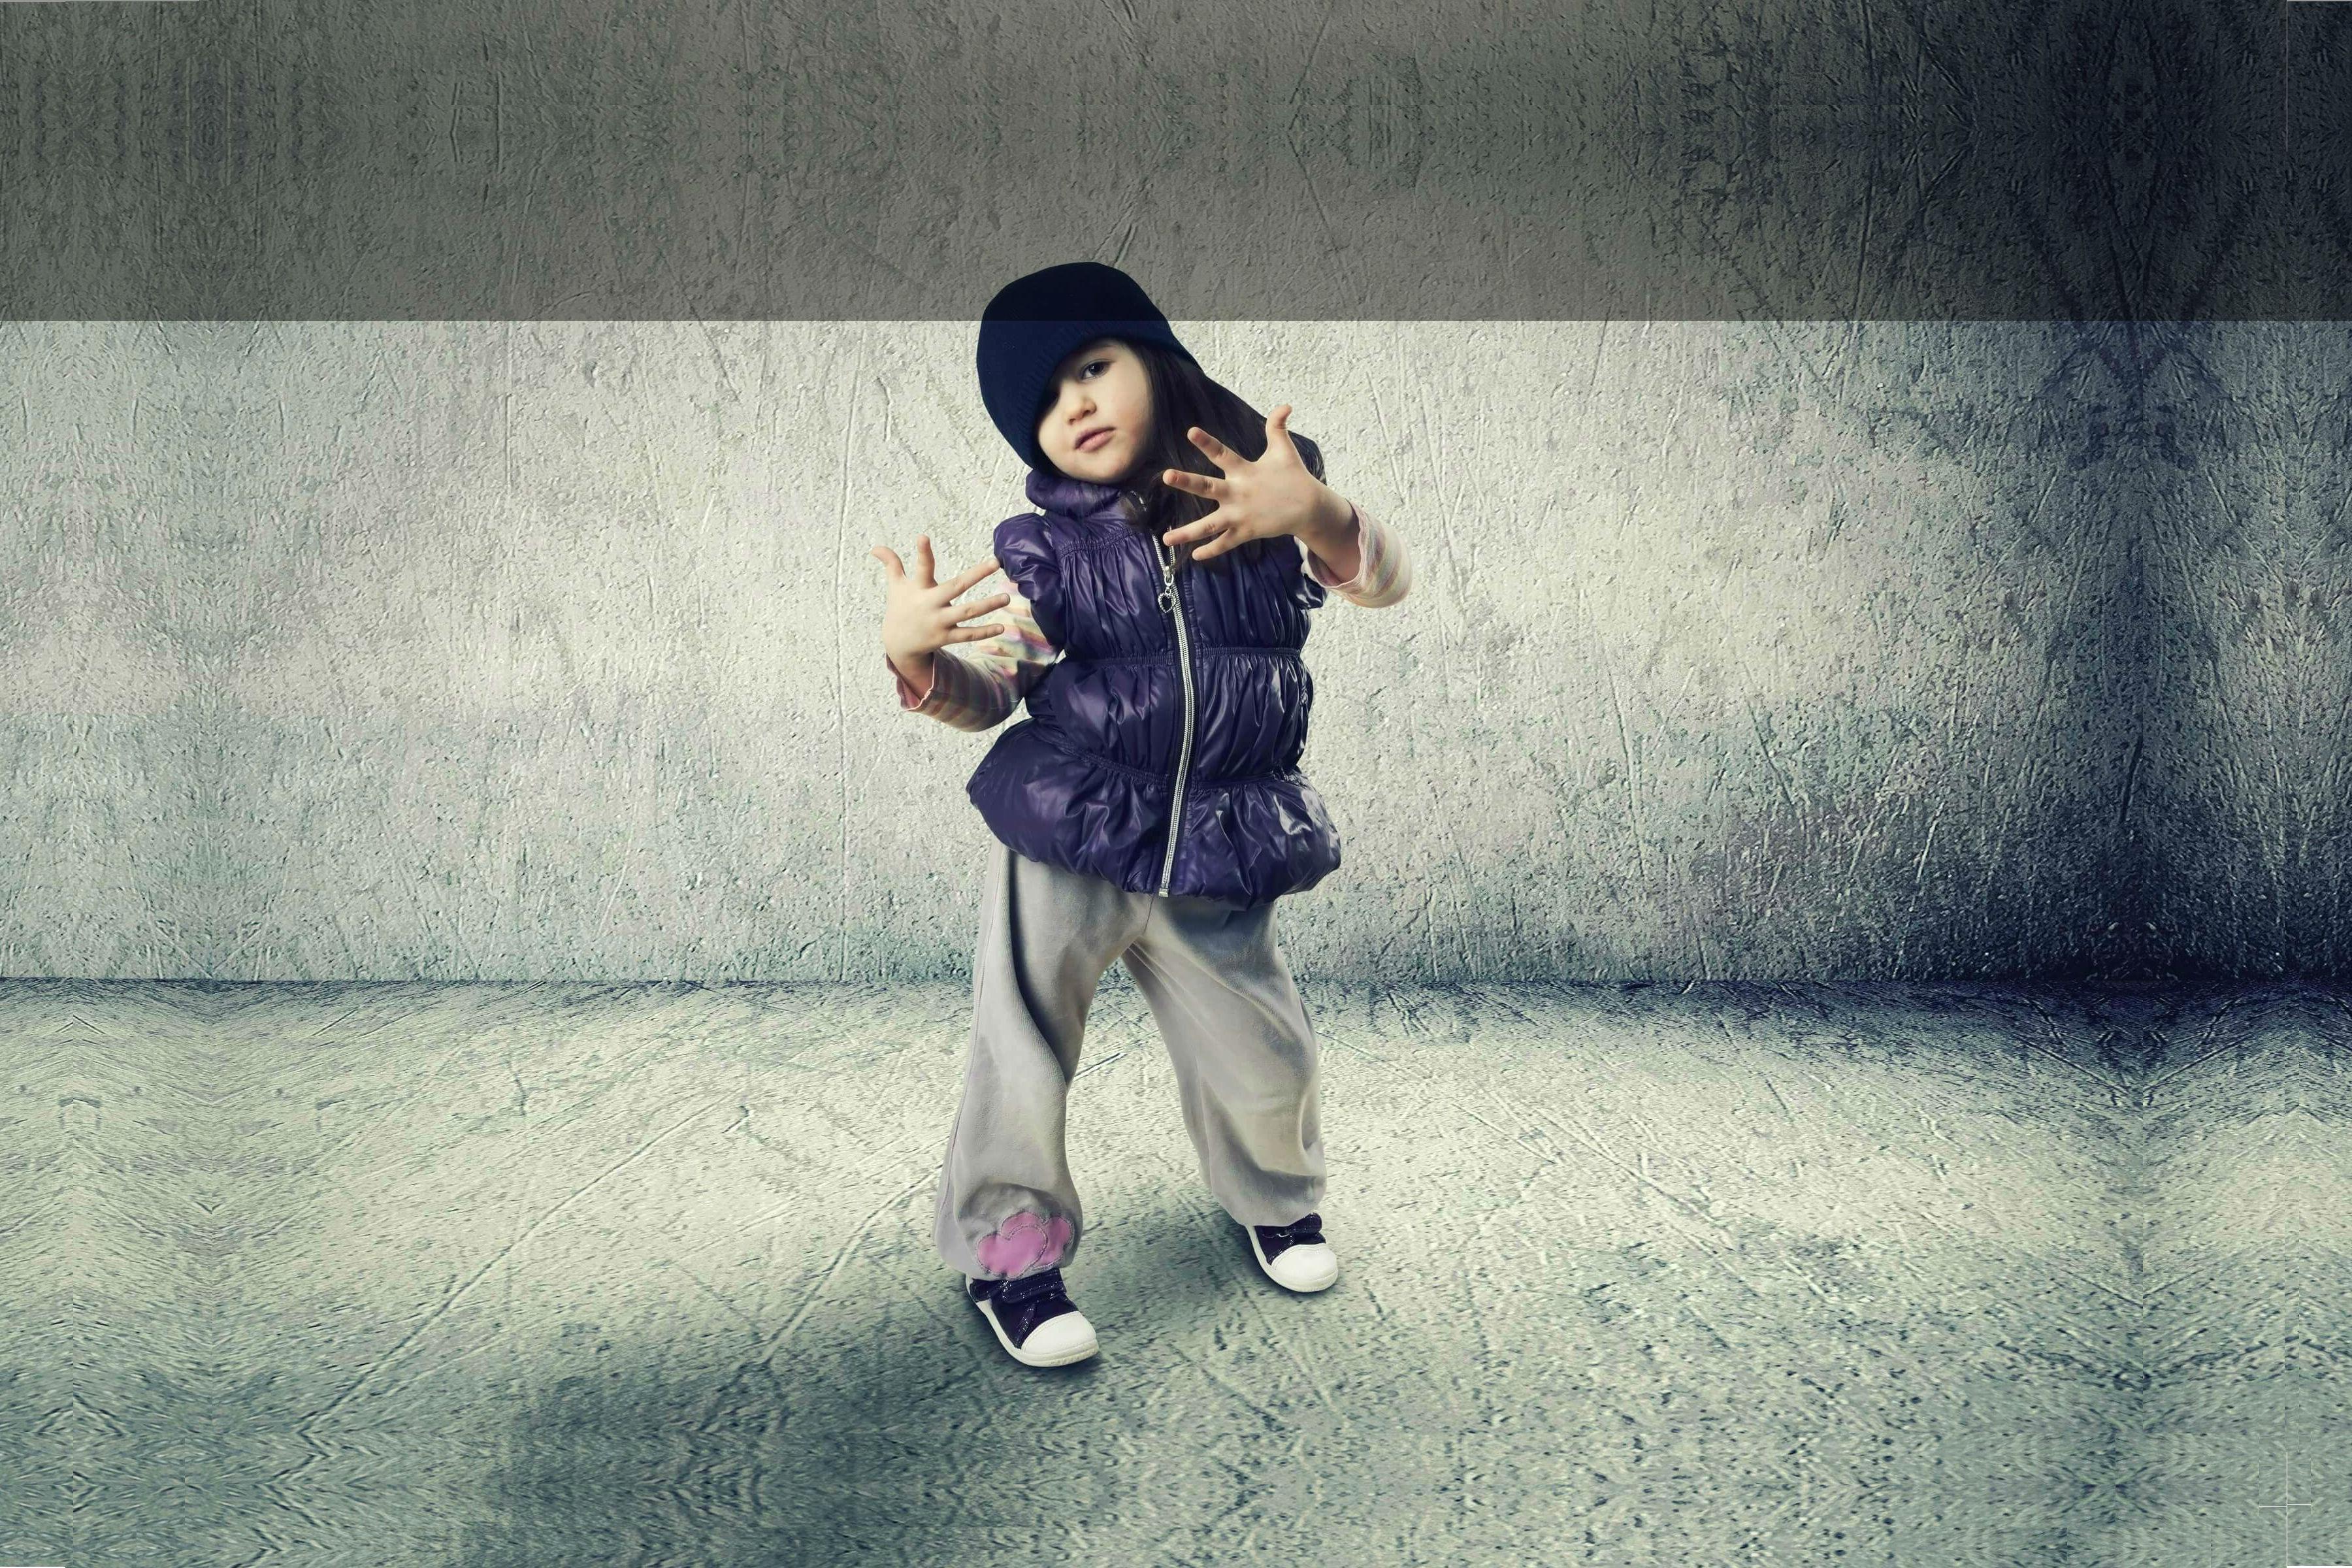 competicion de danza - escuela de danza stardanze